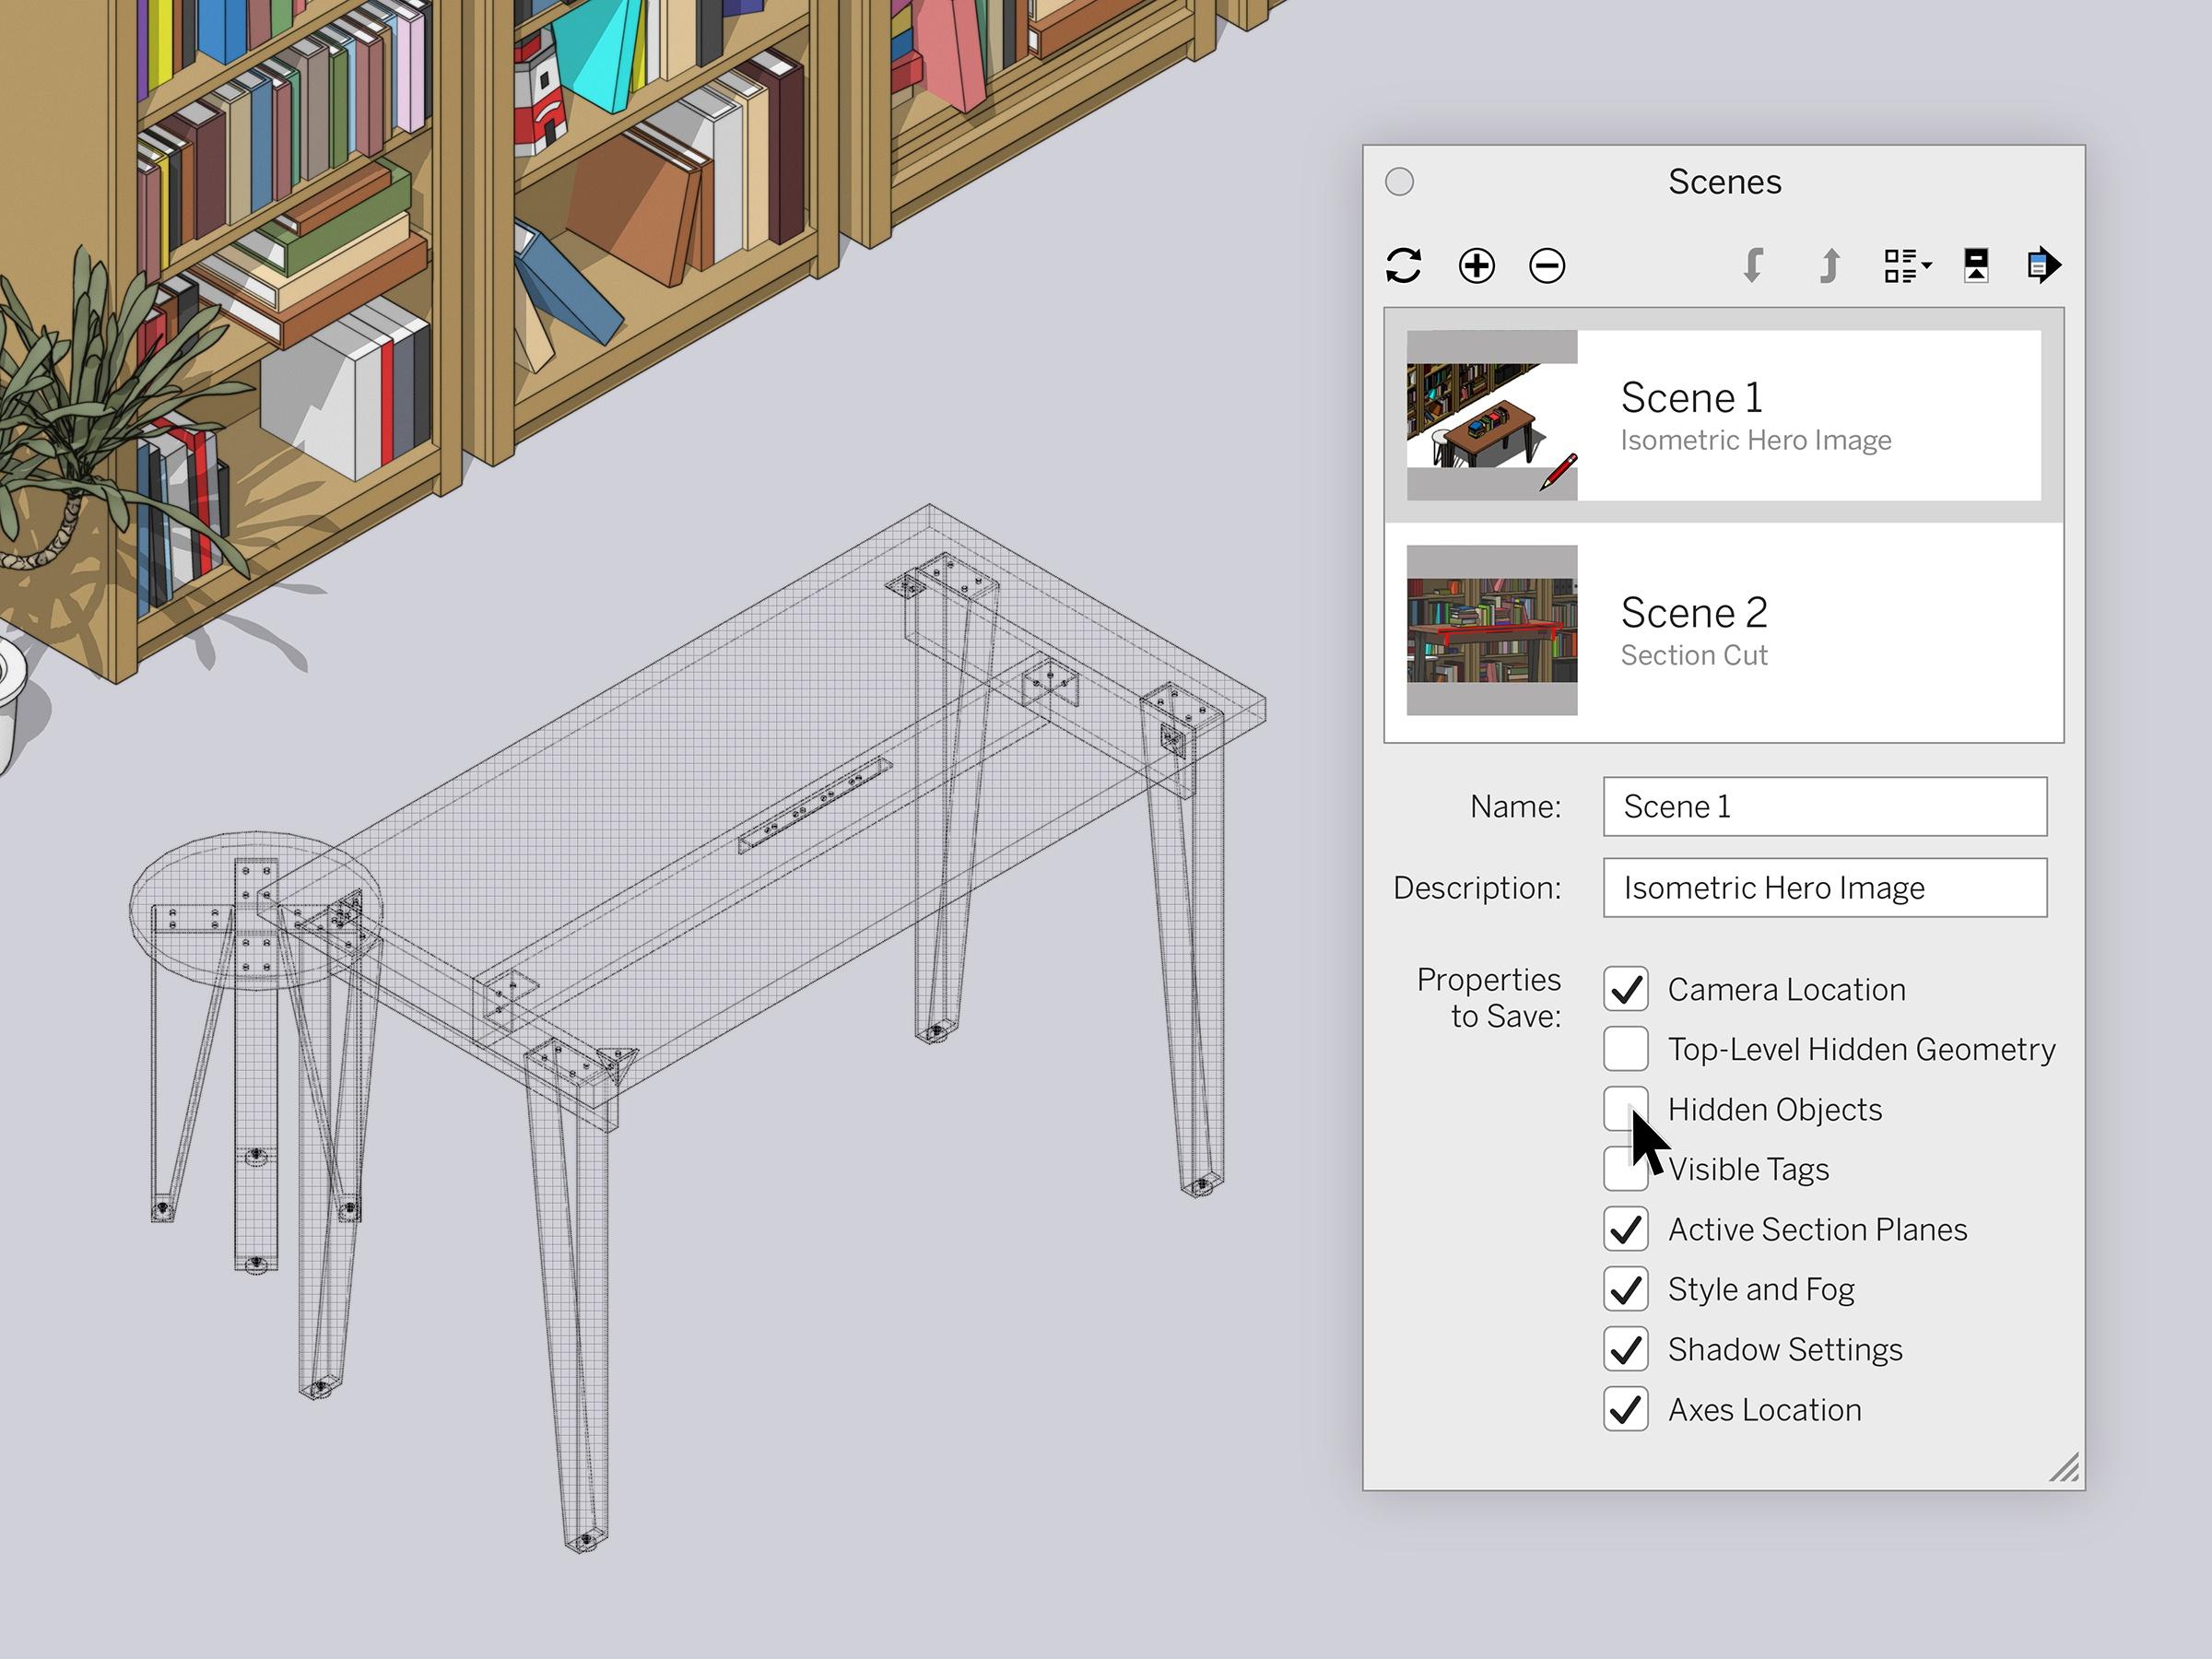 [ SKETCHUP généralité ] MAJ Sketchup 2020 Version 20.1 AHViPTEwMjA5MSZjbWQ9aXRlbWVkaXRvcmltYWdlJmZpbGVuYW1lPWl0ZW1lZGl0b3JpbWFnZV81ZTk2MGU1MDdkYTllLmpwZyZ2ZXJzaW9uPTAwMDAmc2lnPTViYTYyMmFlMDVhMjI4ZDllYTAxYmUyNzc5MzJjMzM2